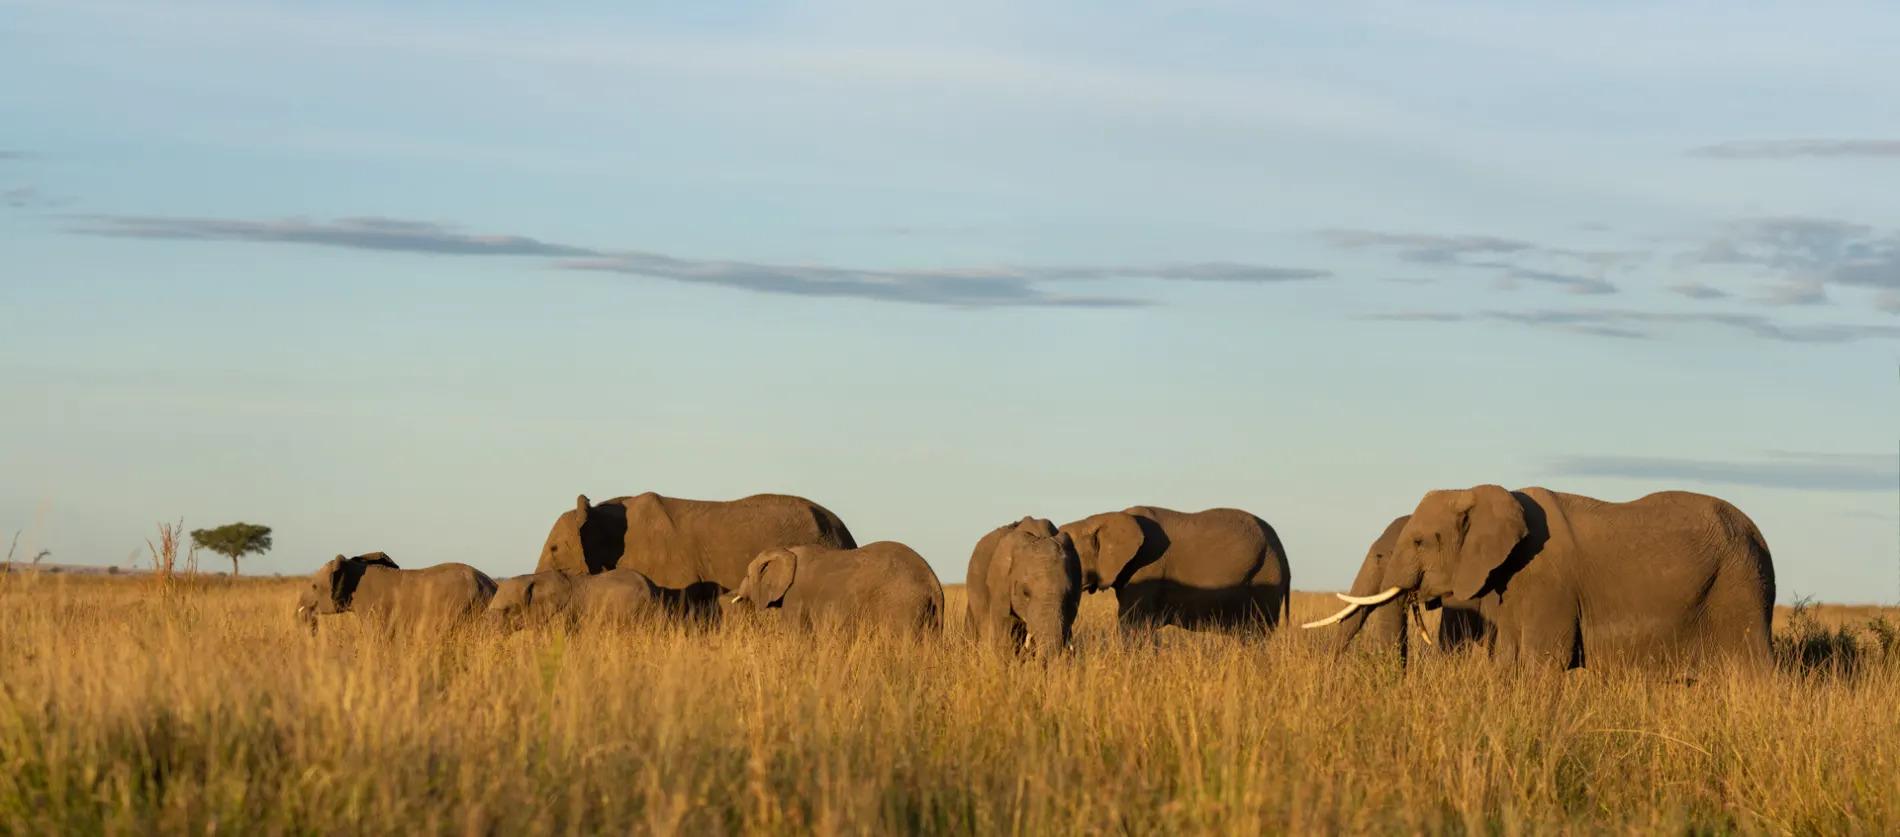 Elephants-Pano